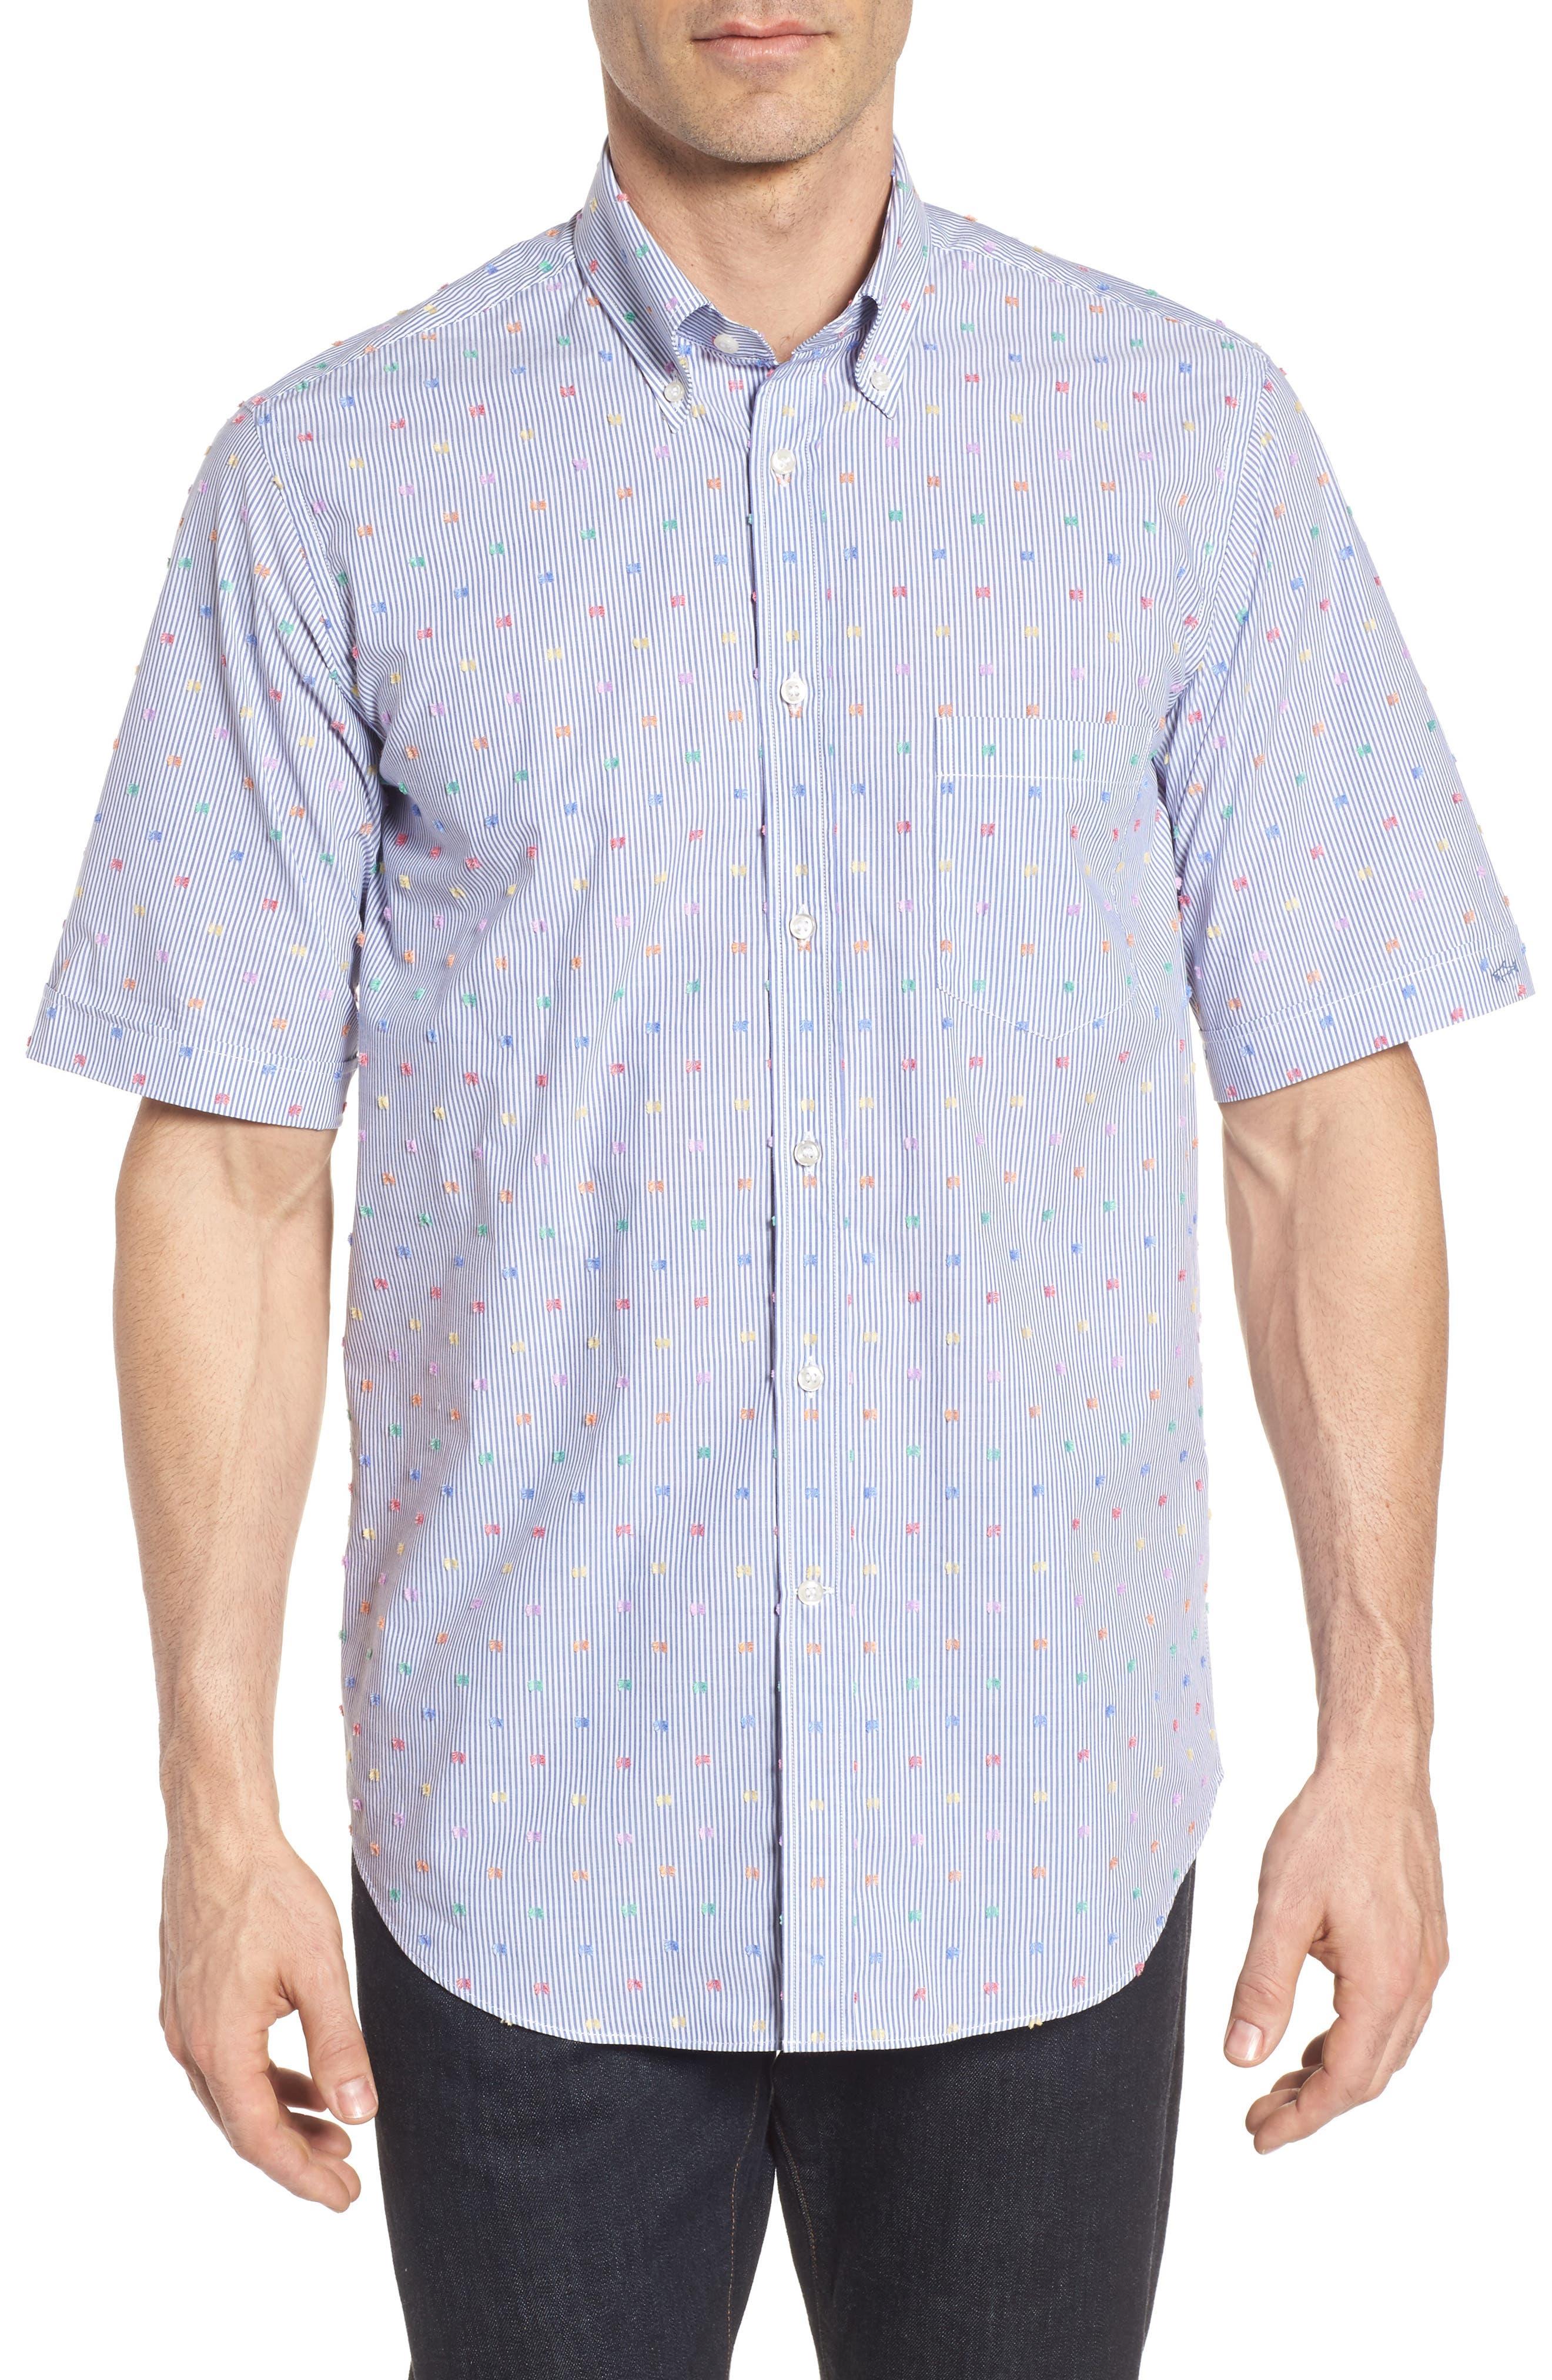 Paul&Shark Fin Stripe Sport Shirt,                             Main thumbnail 1, color,                             Blue/ White/ Multi